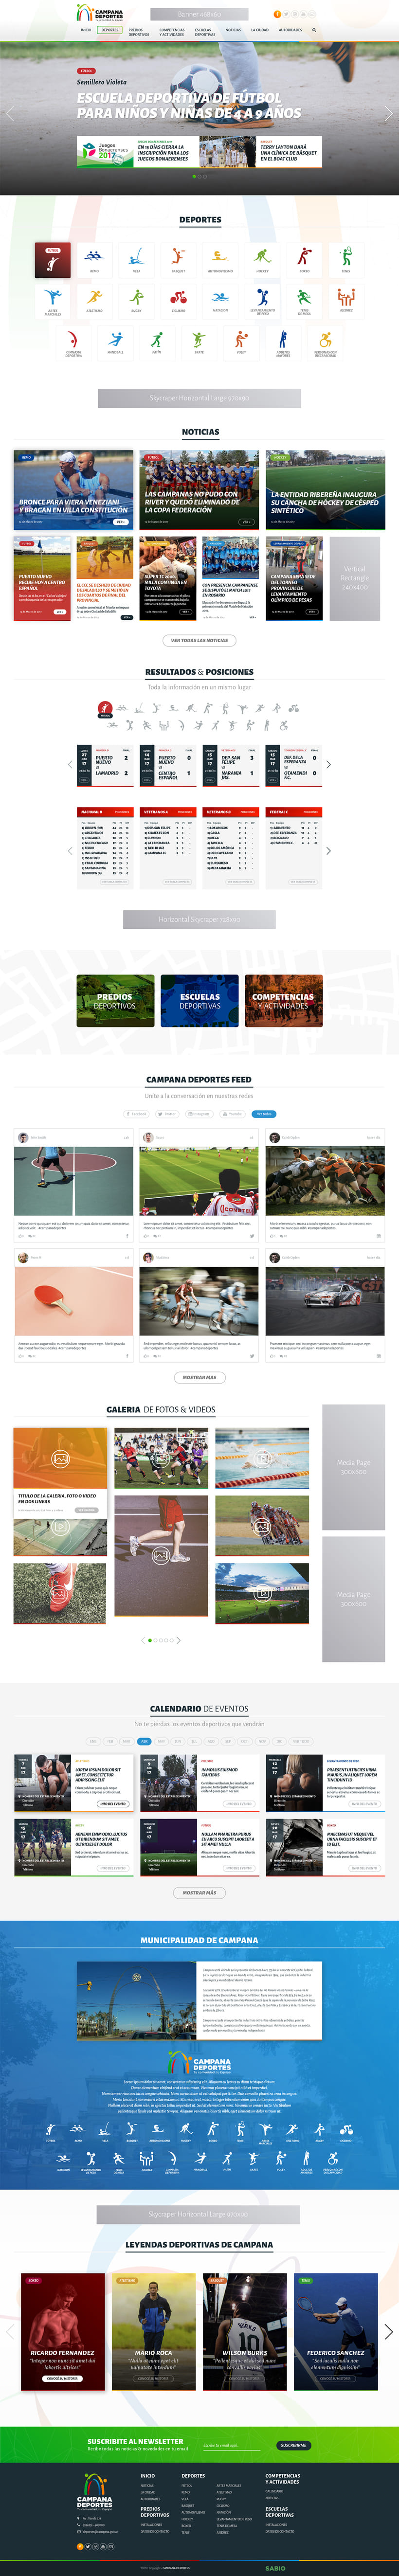 Diseño Web Responsive Portal de Deportes de Municipio -1